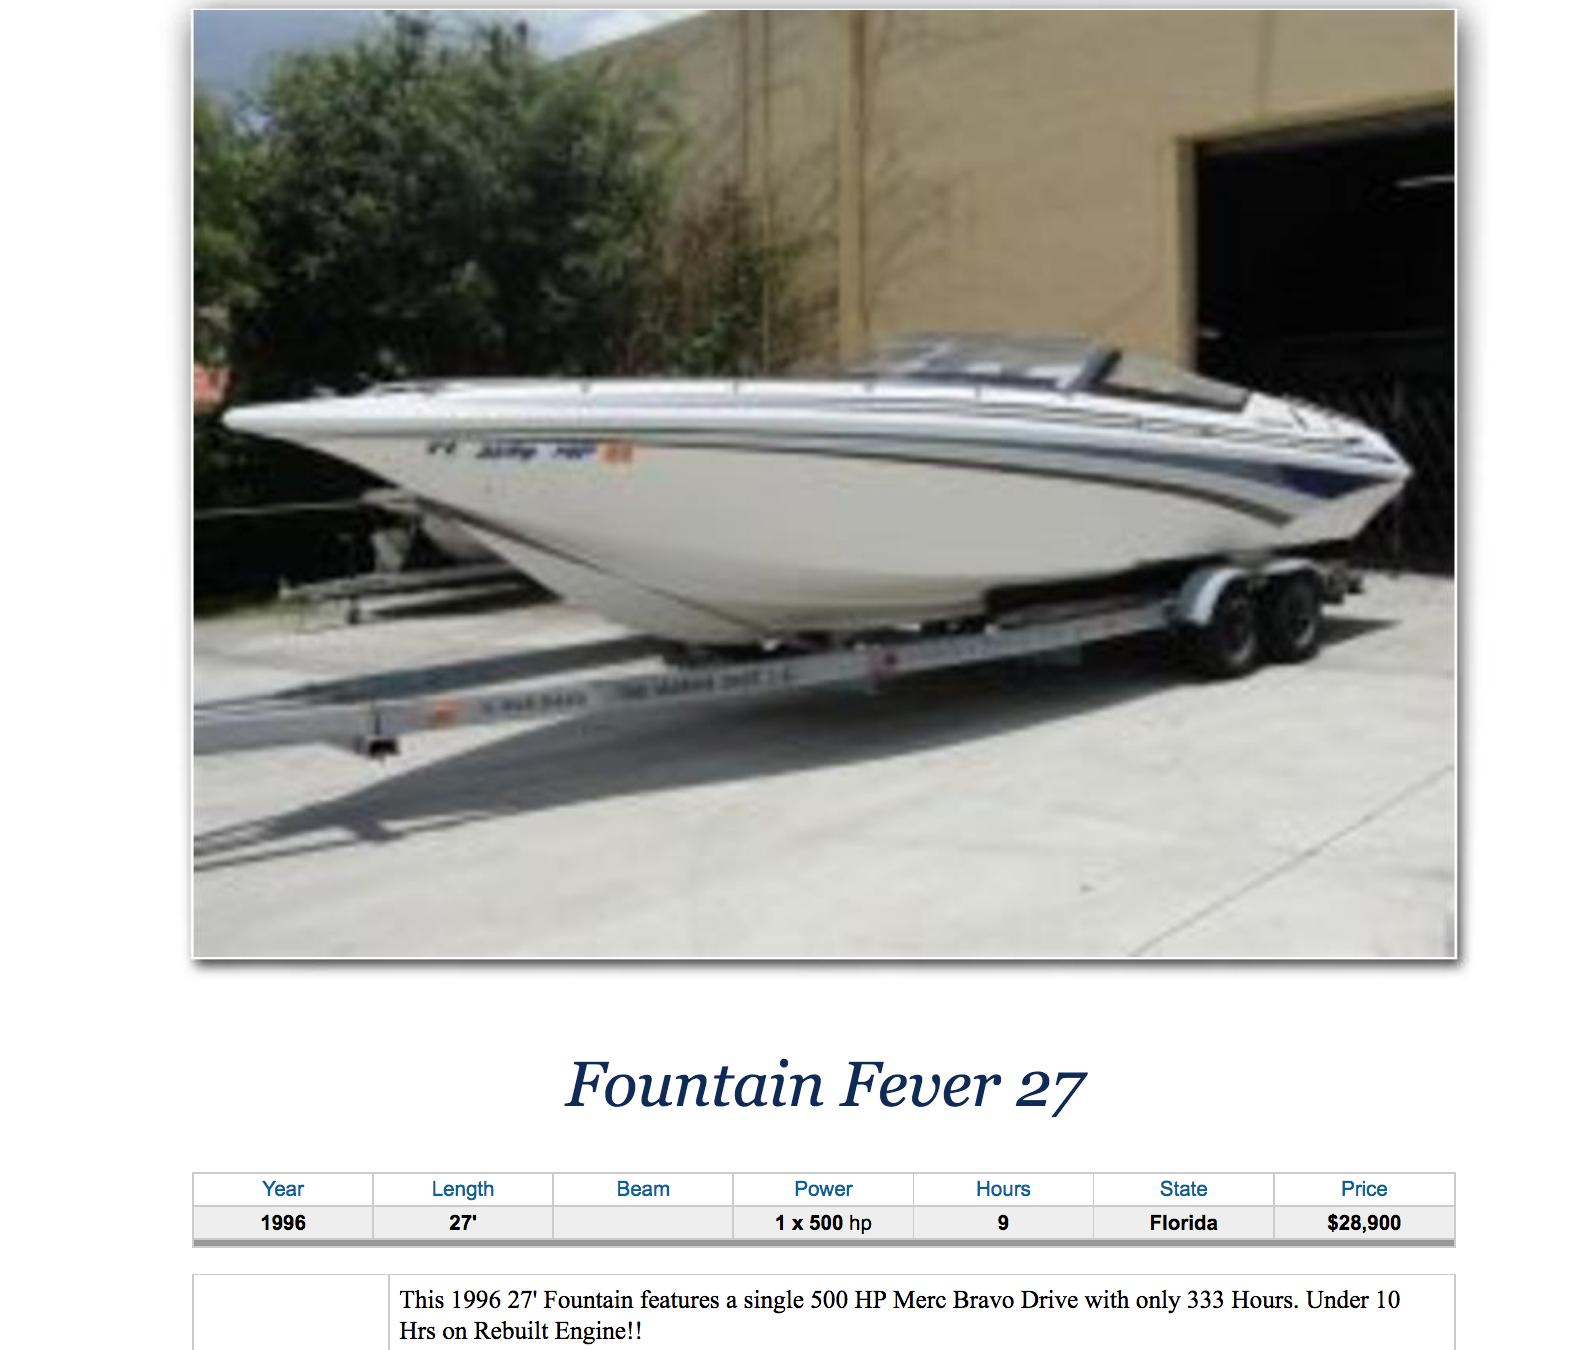 Fountain 27 Fever